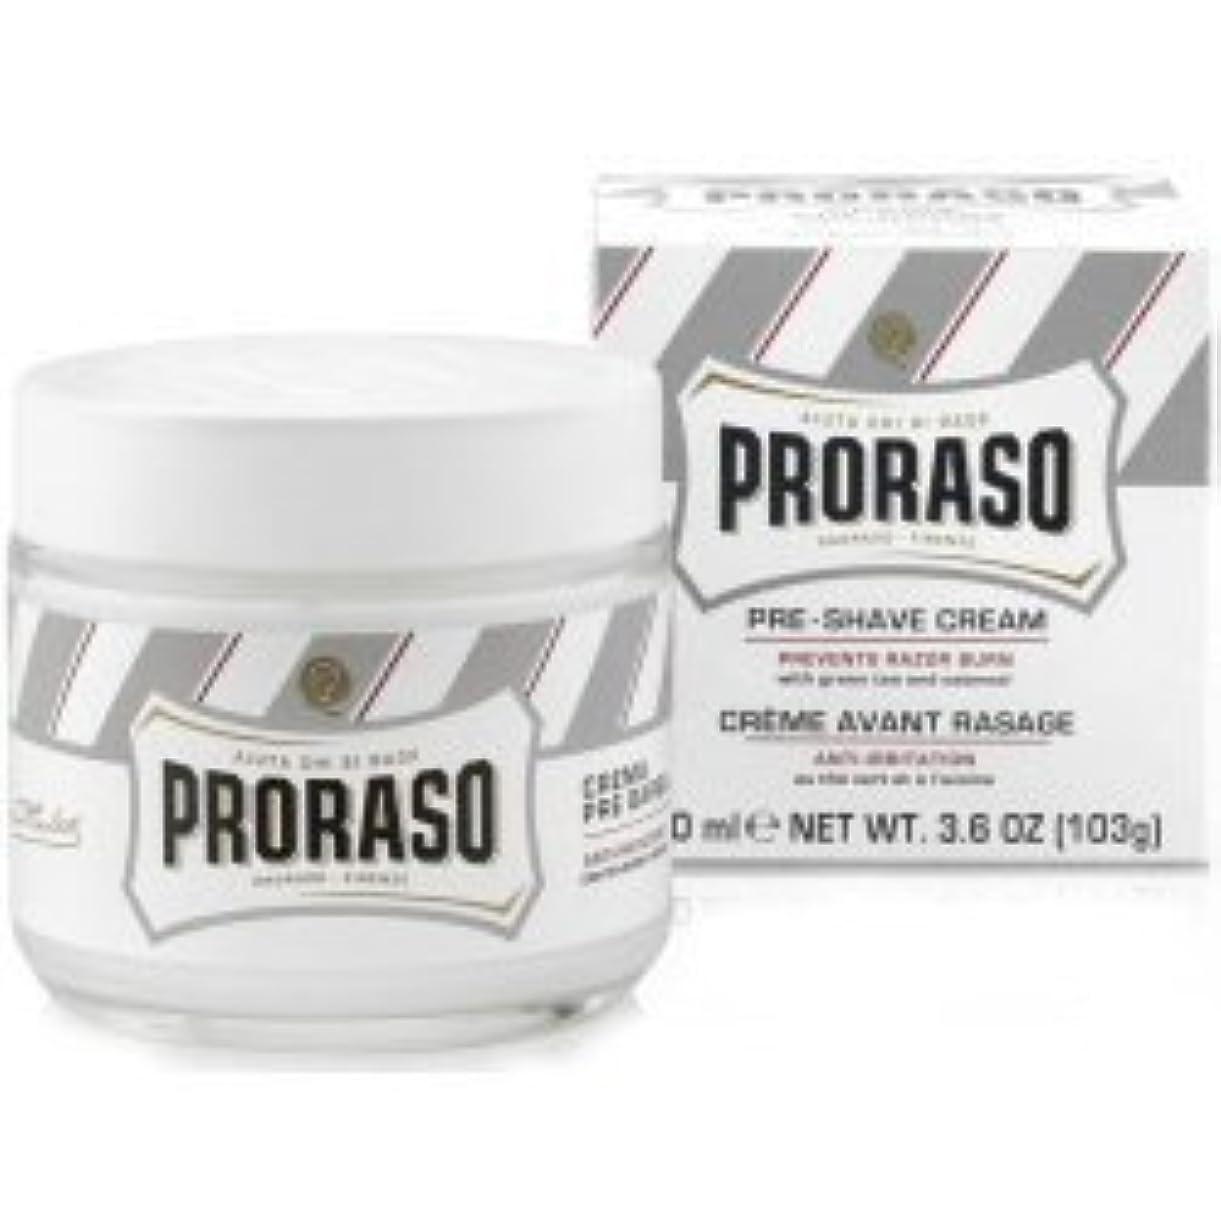 日光教科書登場Proraso Pre & Post Shave Cream Sensitive Skin 100ml by Proraso [並行輸入品]